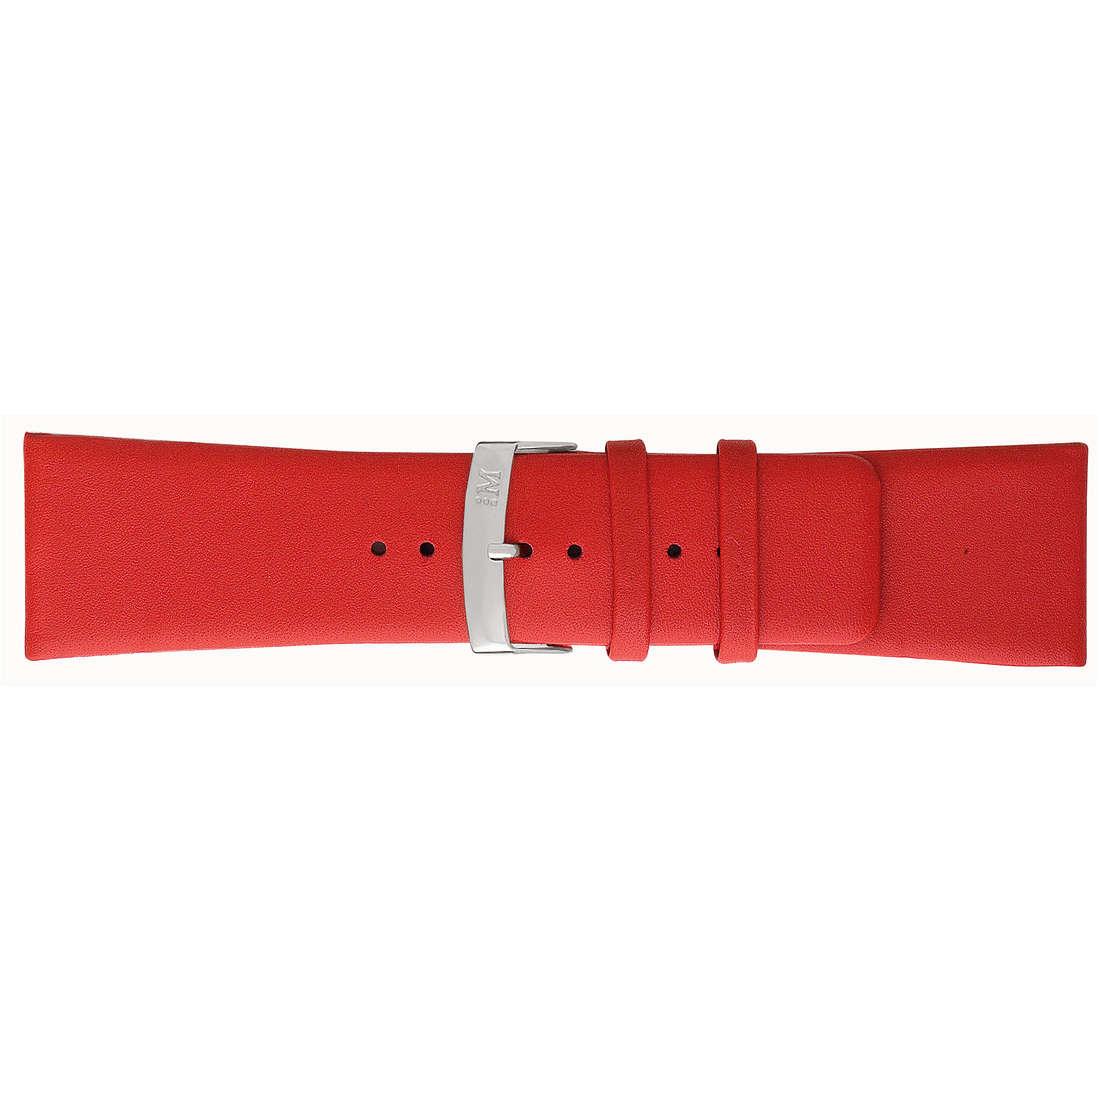 watch watch bands watch straps man Morellato Morellato 1930 A01X3076875083CR20